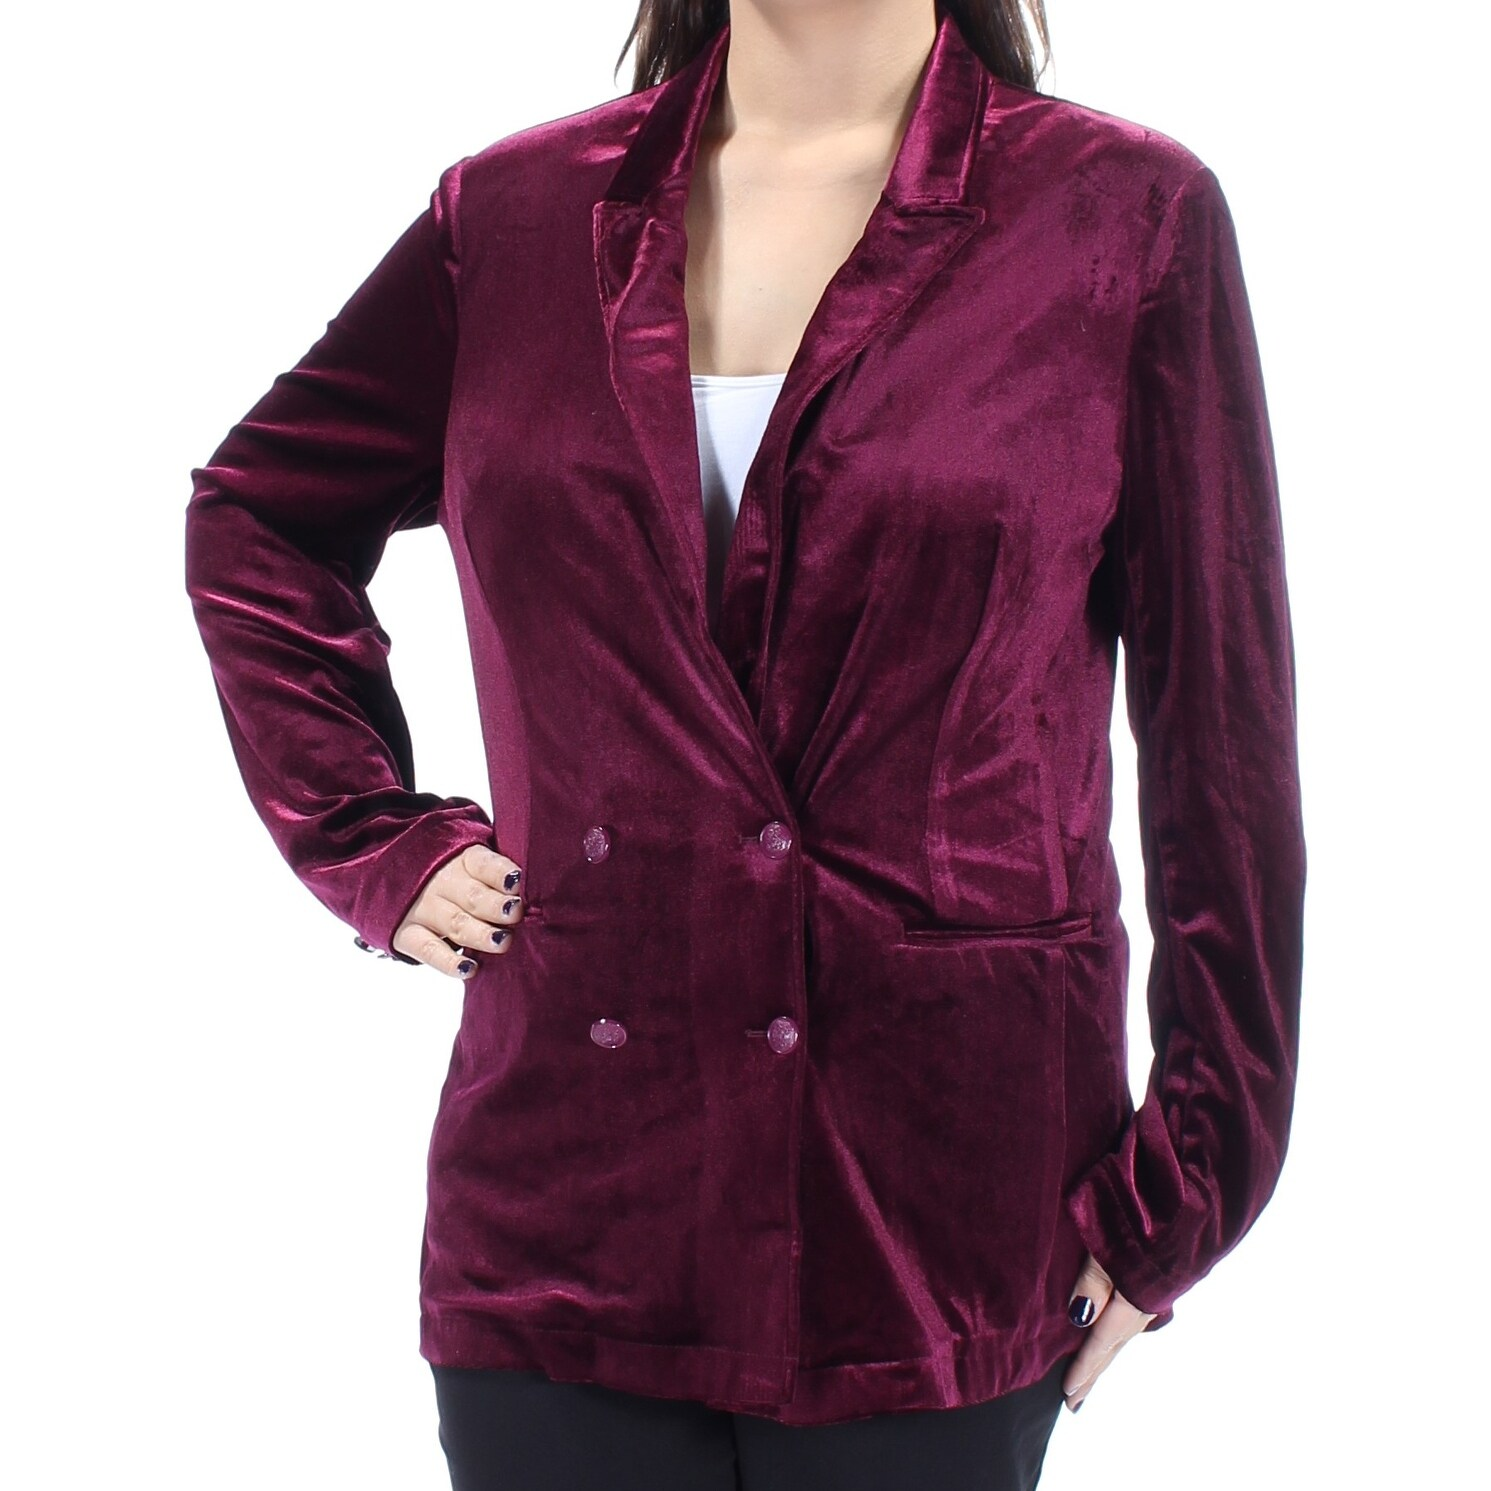 Fairchild Womens Burgundy Velvet Blazer Wear To Work Jacket Size Xl Overstock 21906050